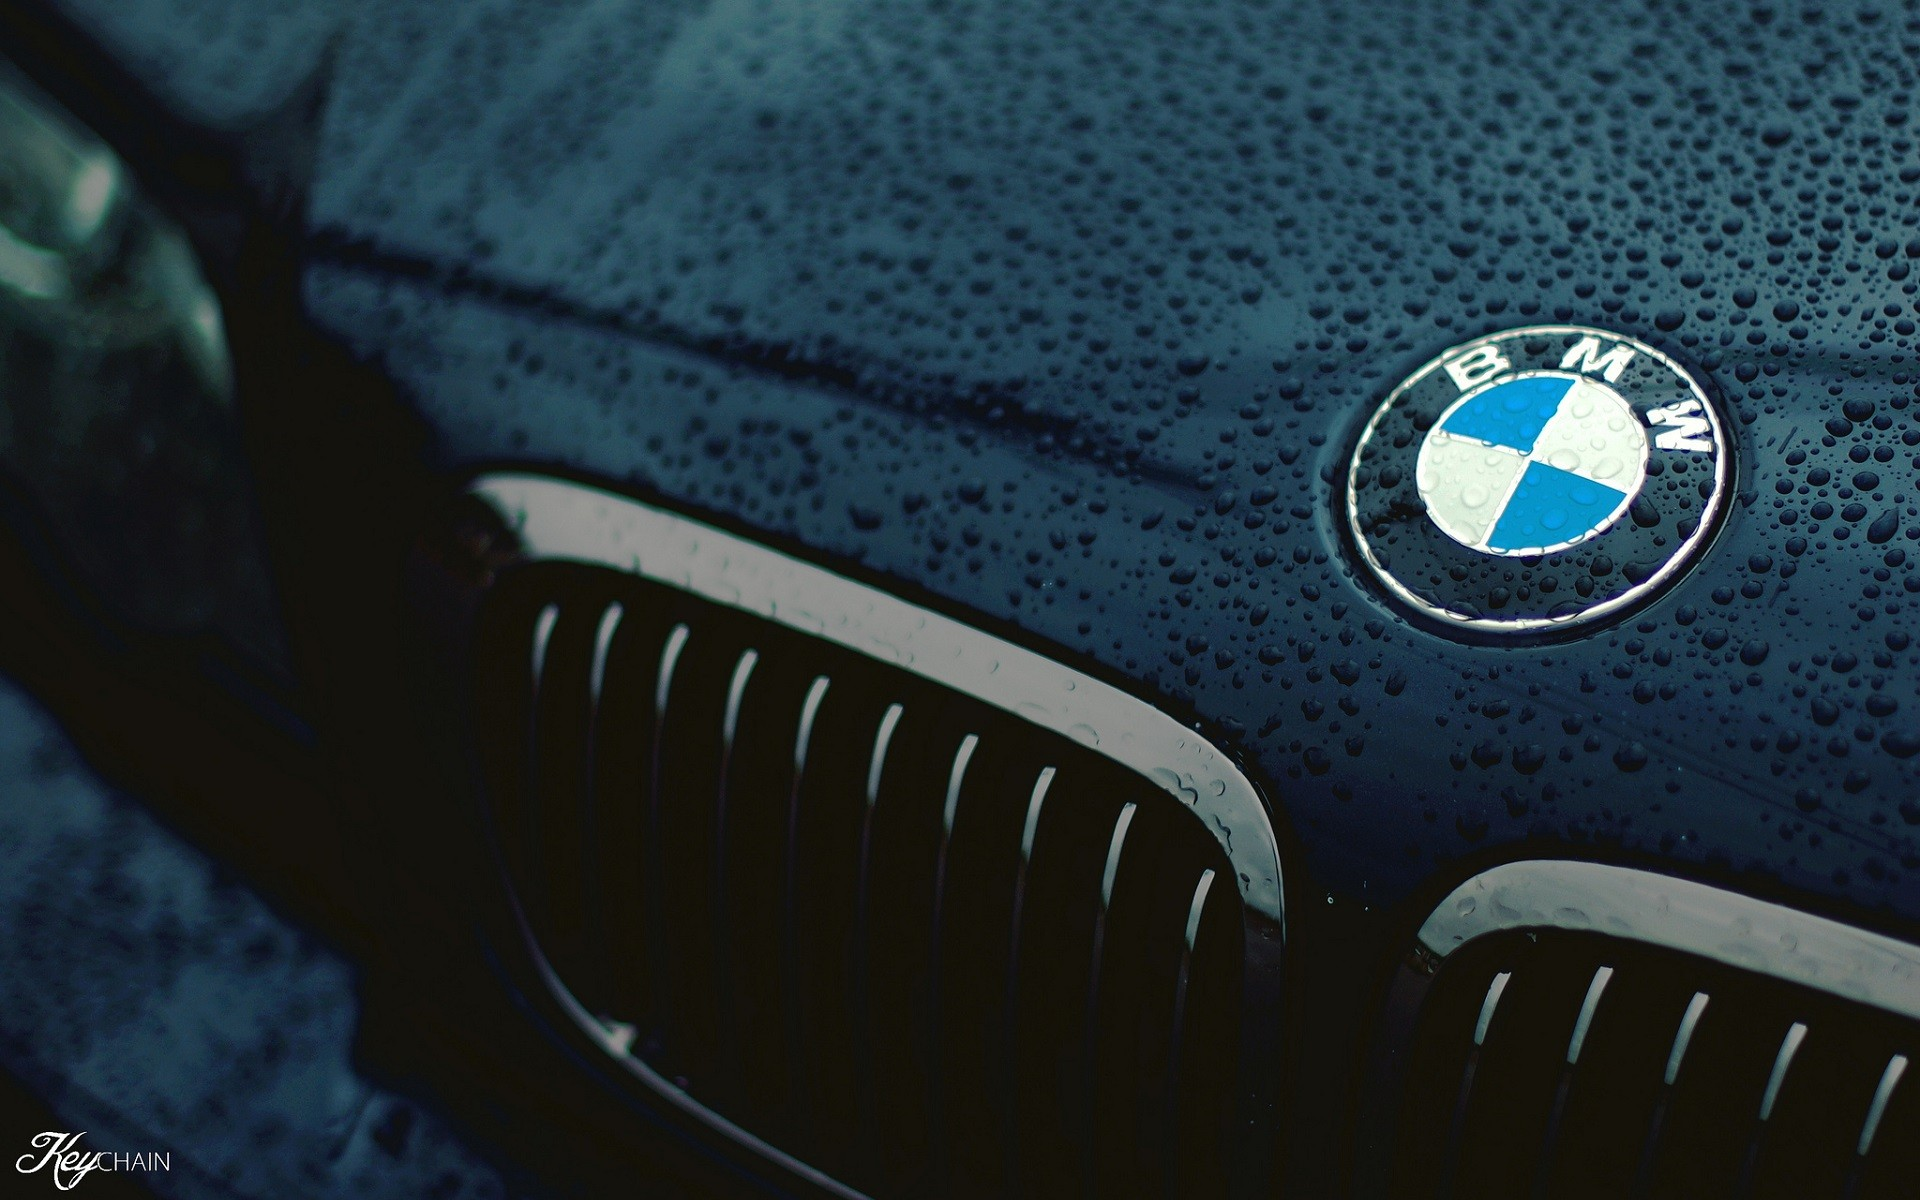 Car Wallpaper Hd 1080p Free Download For Mobile Car Bmw Closeup Logo Black Water Drops Wet